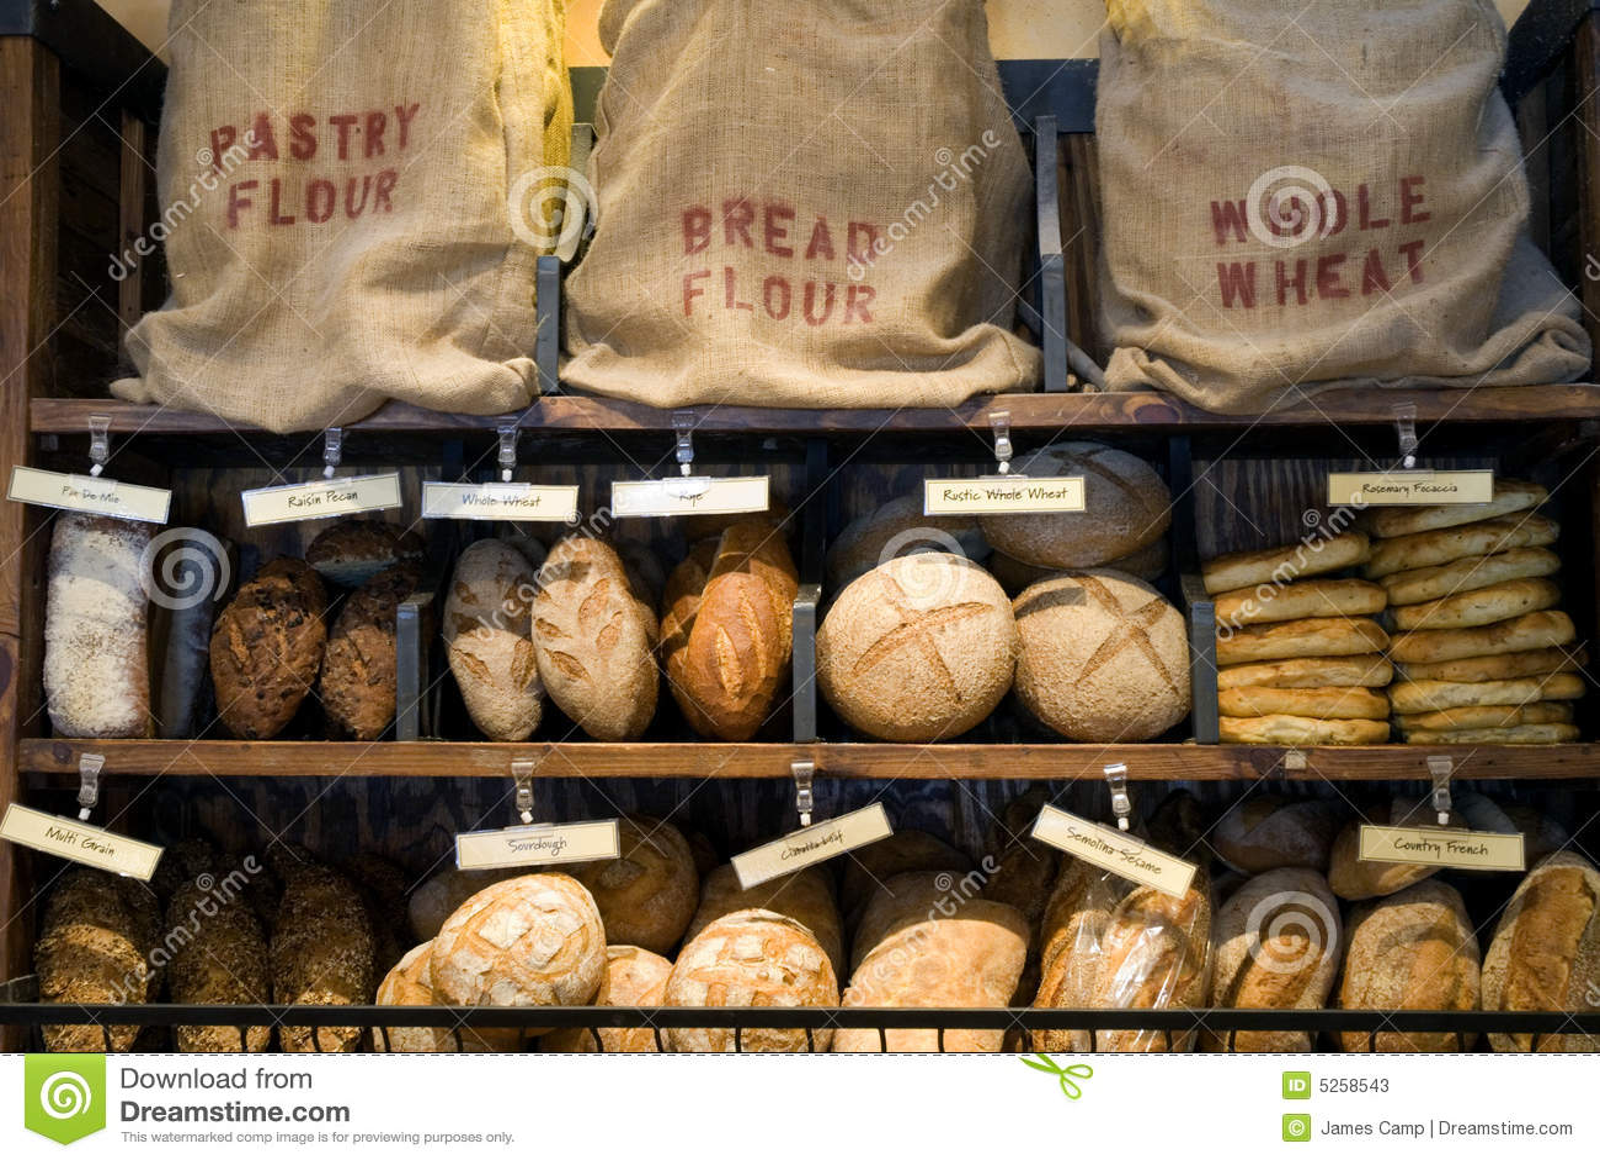 Bread Display Stock Photos Image 5258543